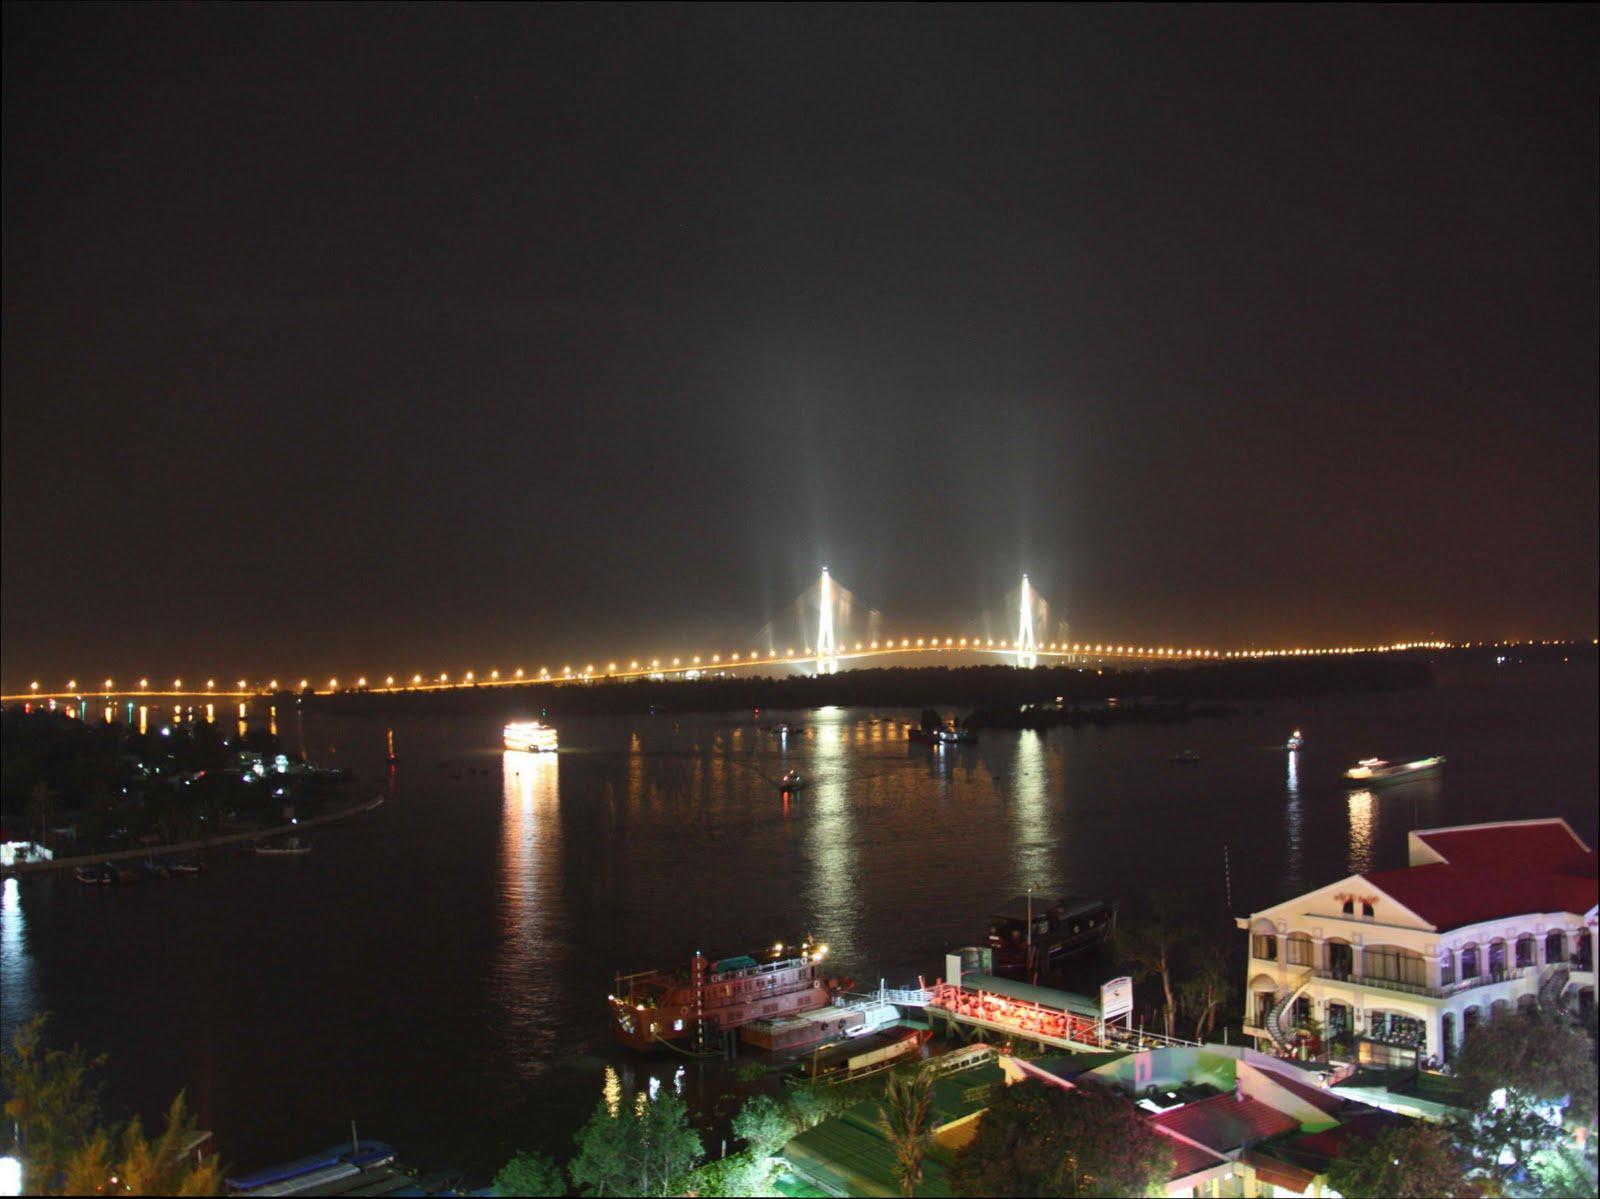 http://4.bp.blogspot.com/-mhq8TrJZnn8/TtaBk04ELlI/AAAAAAAAC2w/jAll6OZaEG4/s1600/Puente_nocturno_Can_Tho_Vietnam.jpg